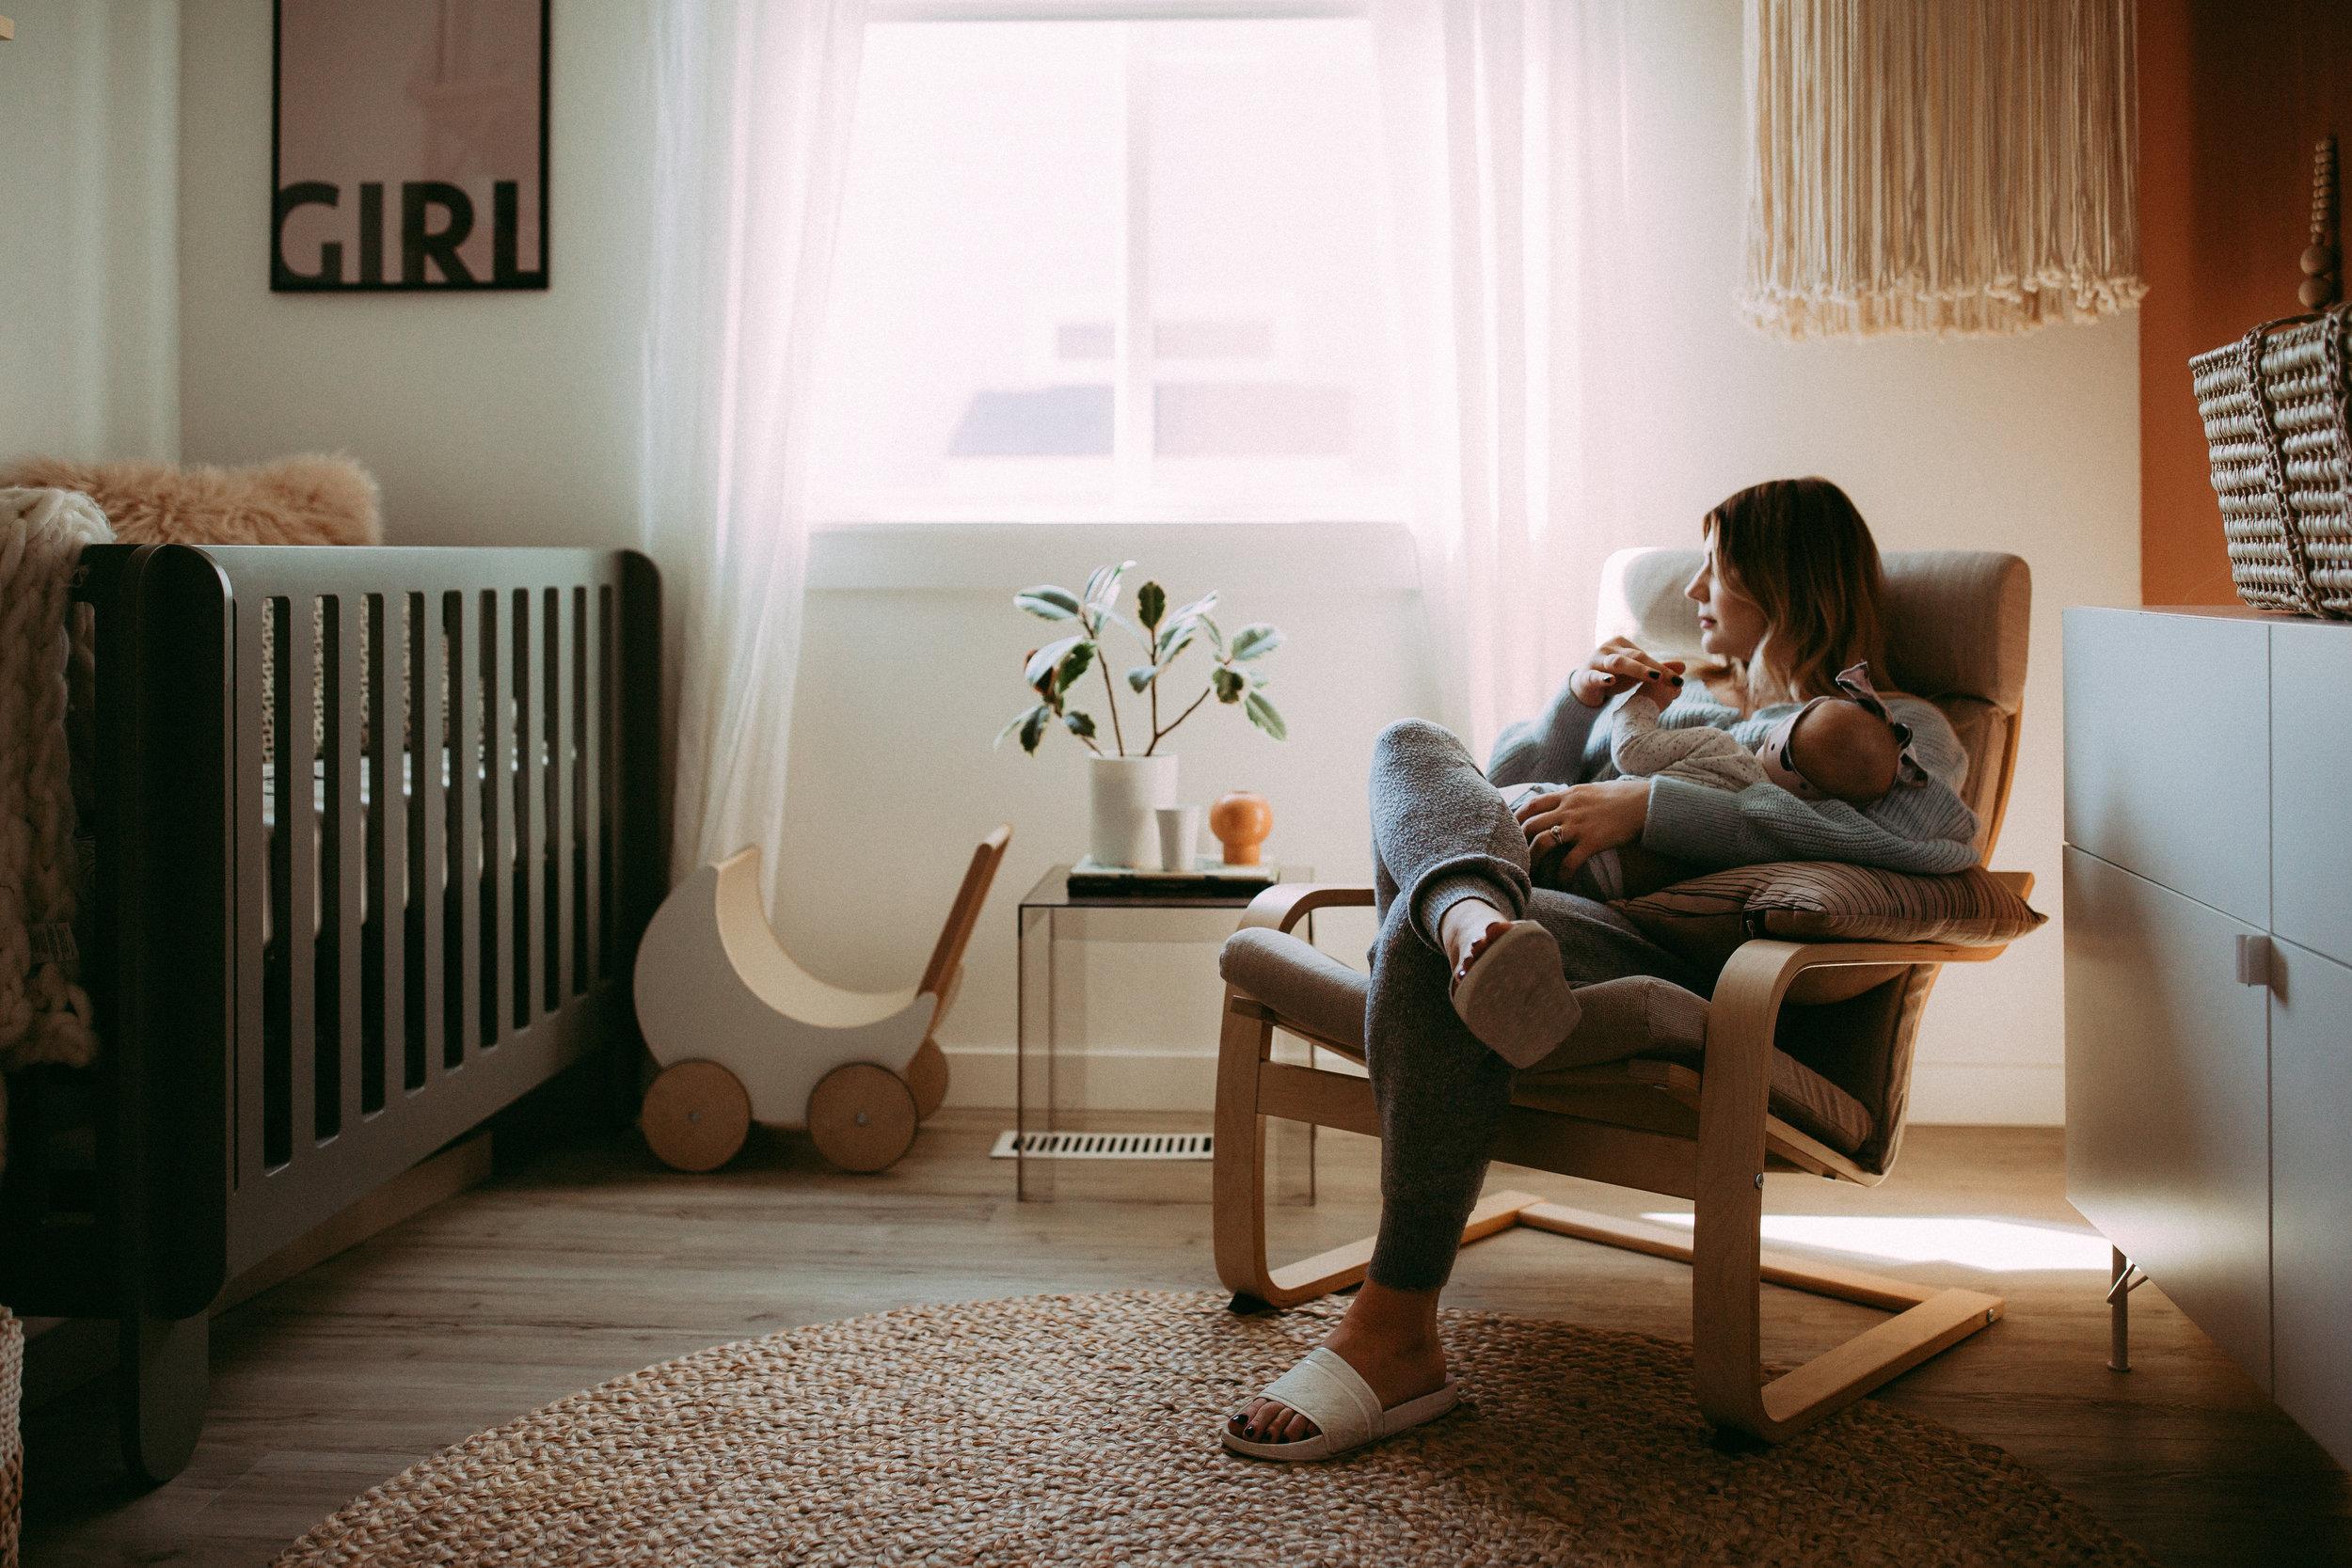 nursery interior design boise idaho.jpg